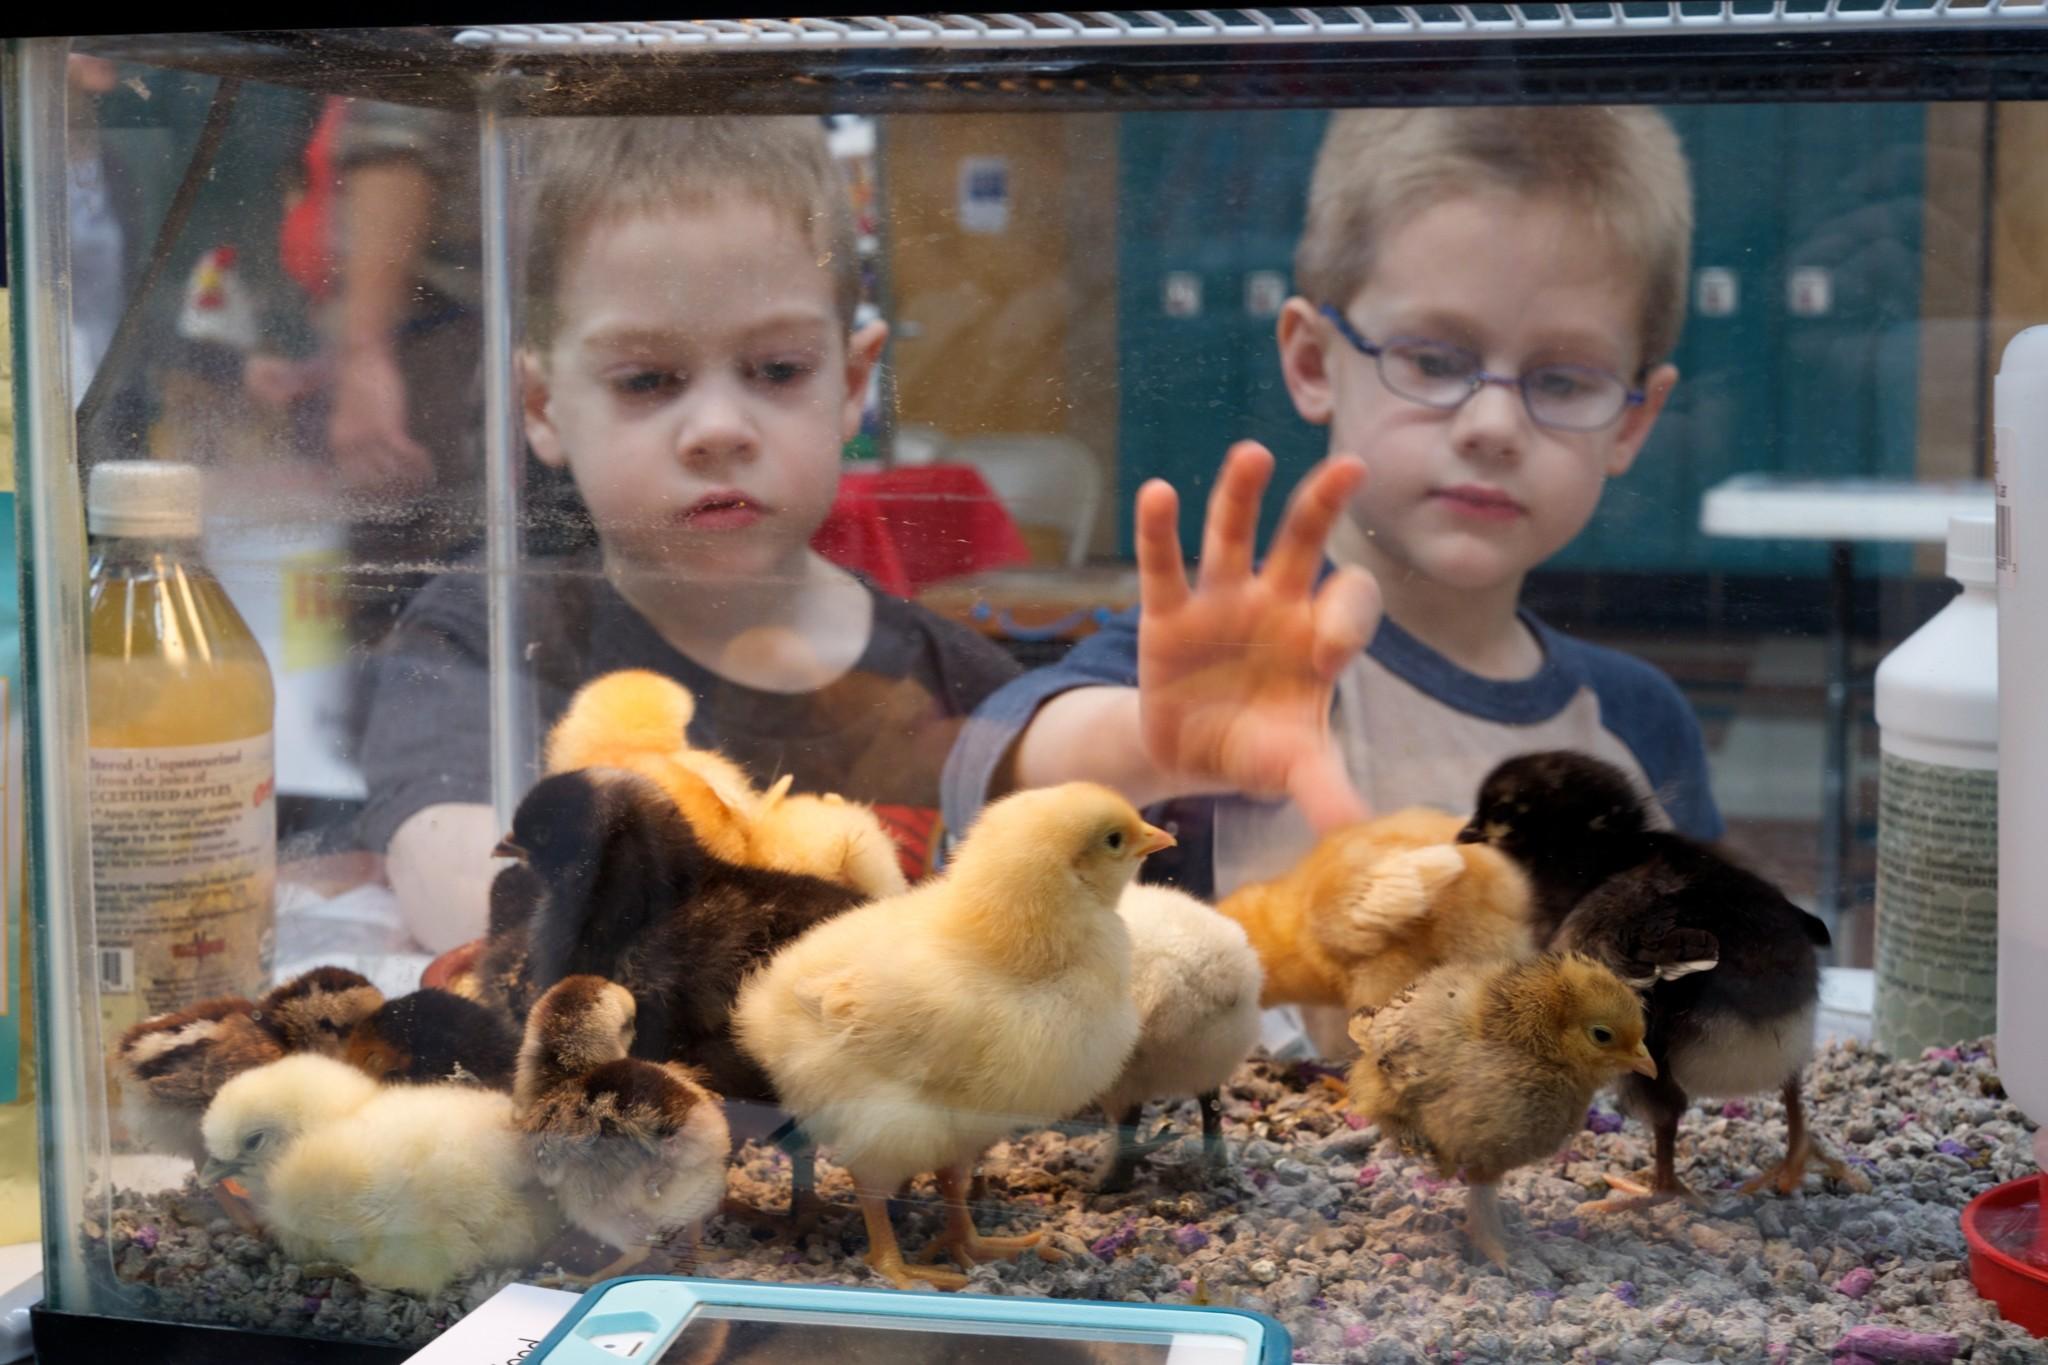 Kristen Hollinden's sons look in on a group of chicks huddling below a heat lamp. (Benjamin Unger)